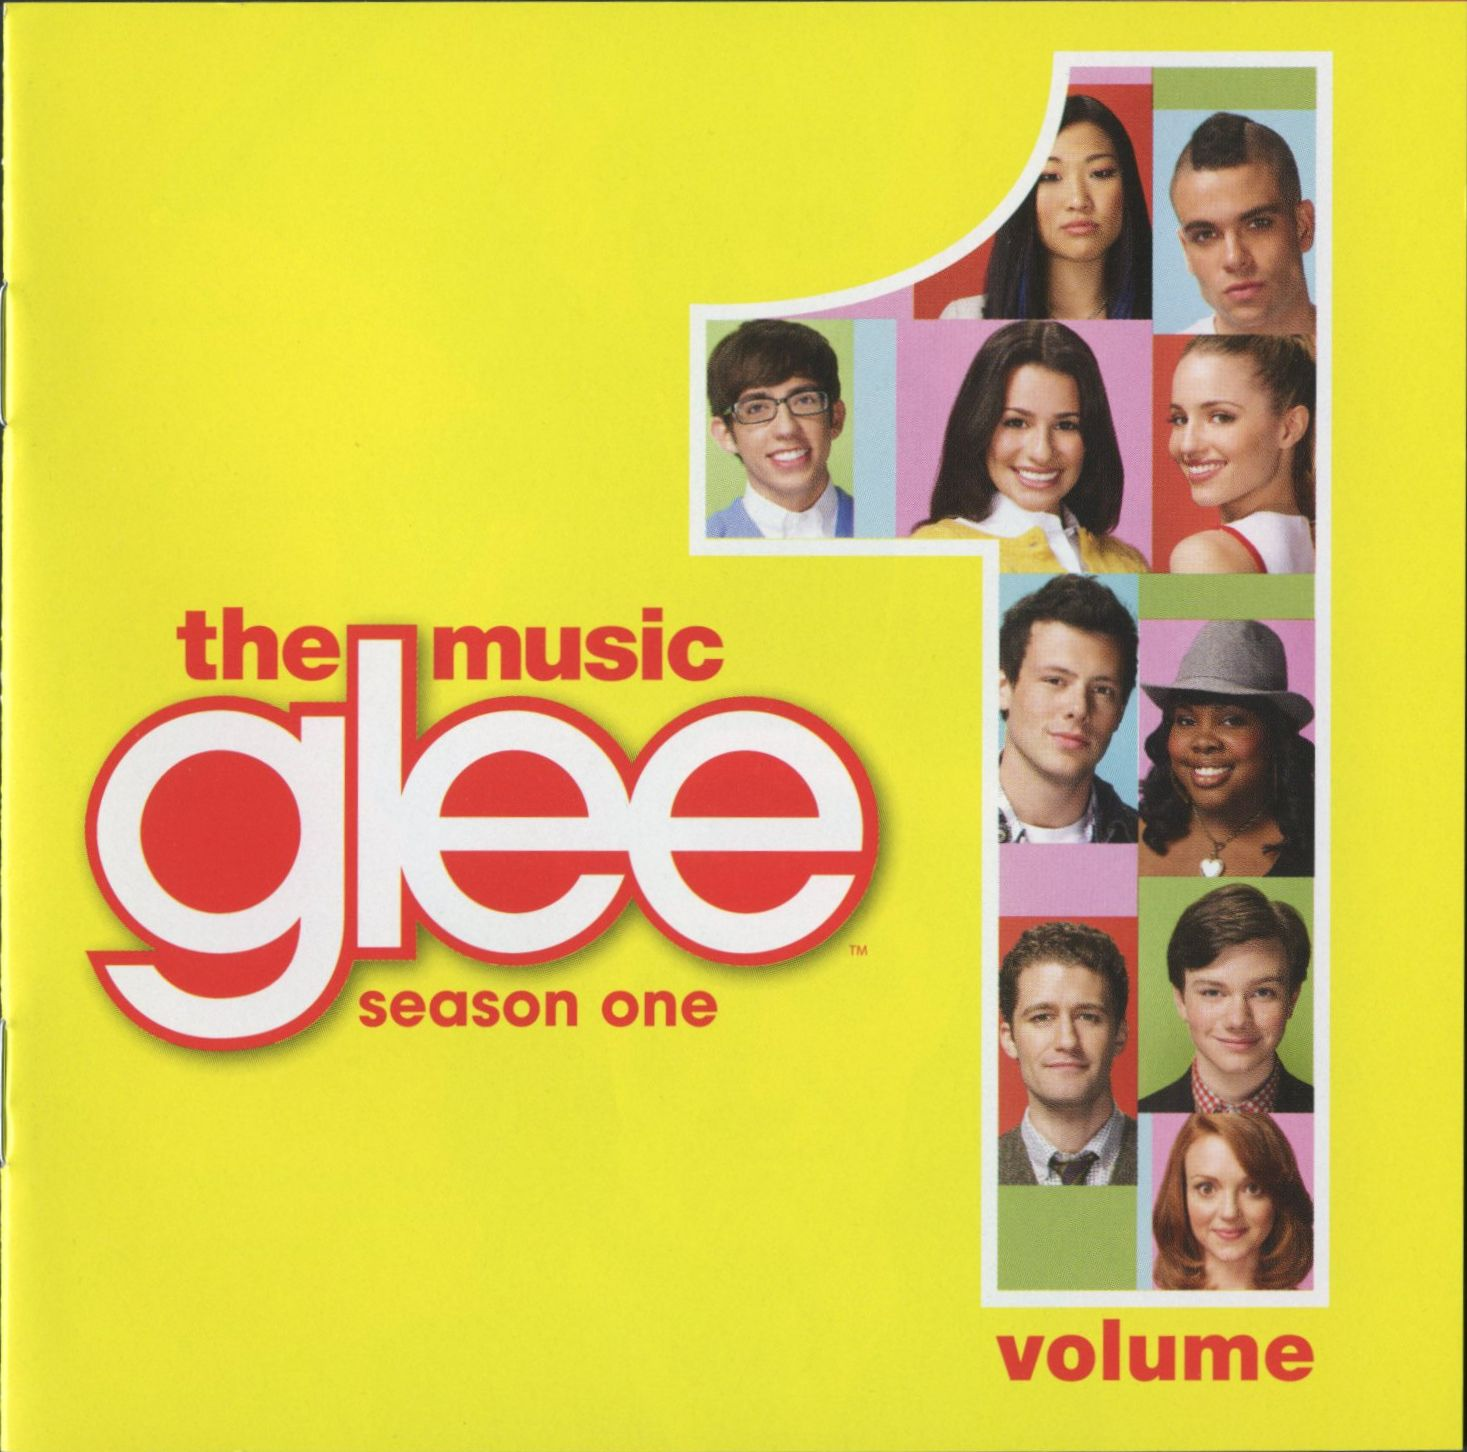 Glee the Music Volume 1